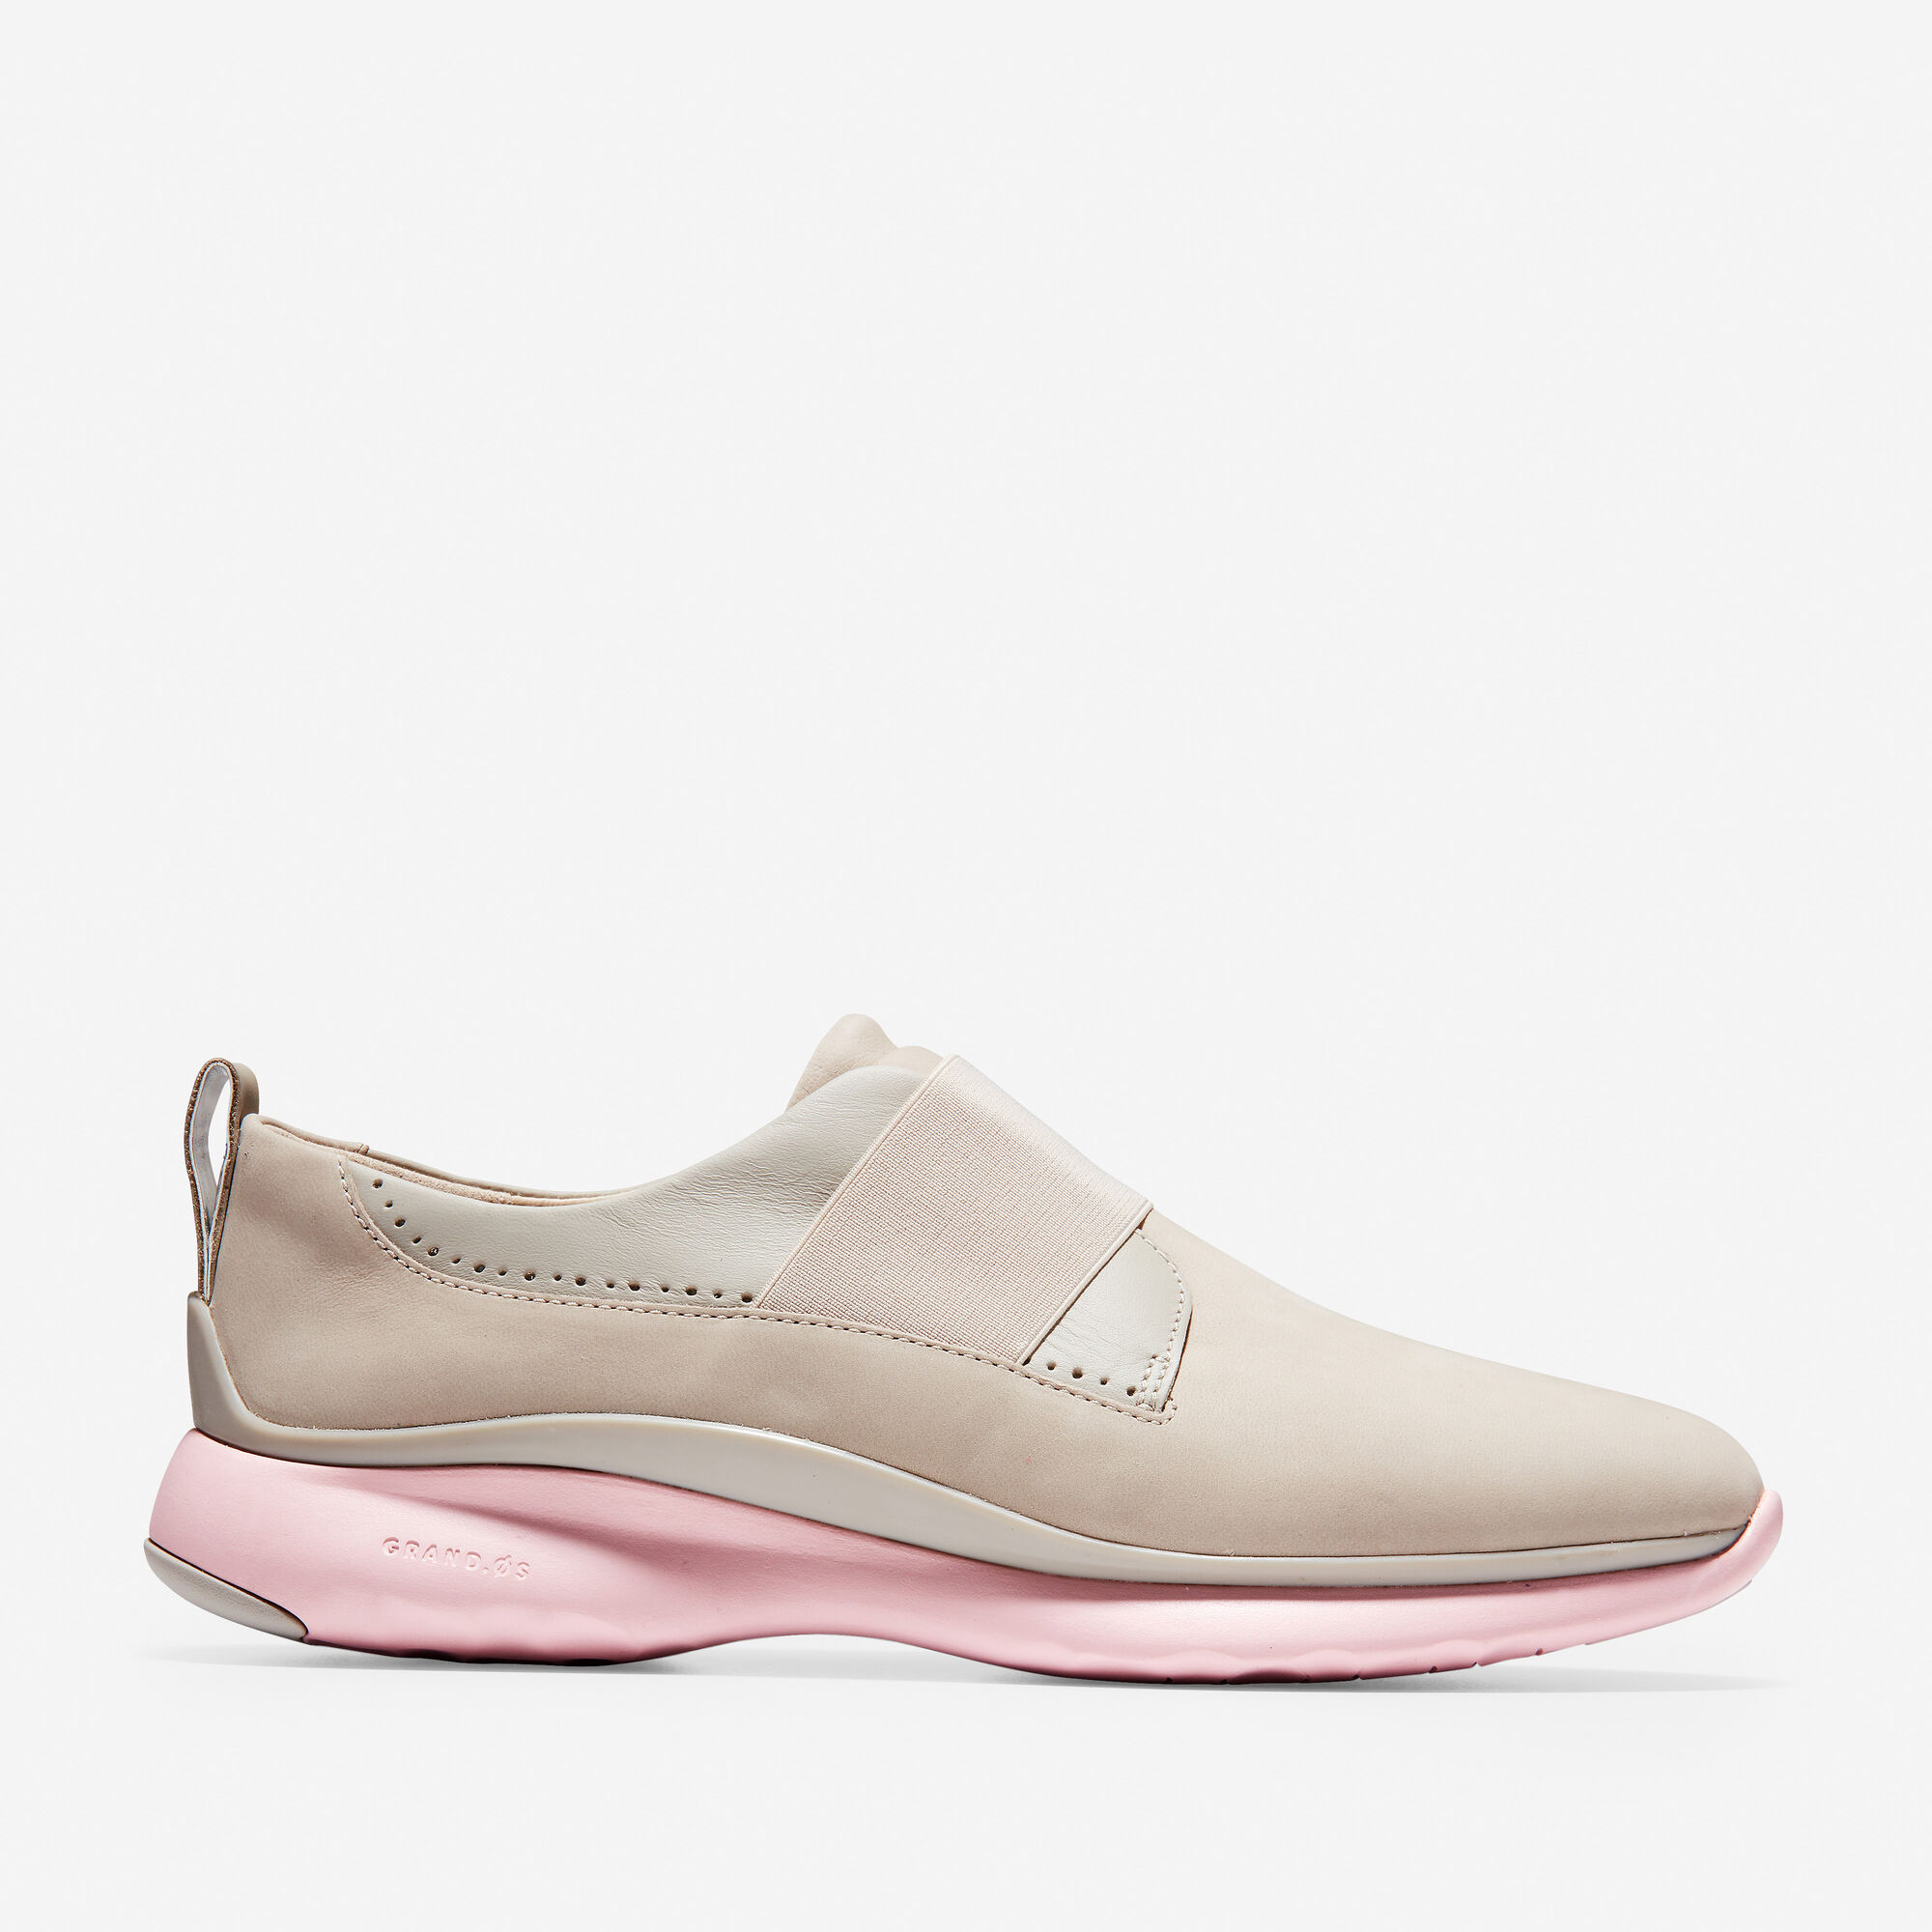 Cole Haan Women's 3.ZEROGRAND Oxford Shoes